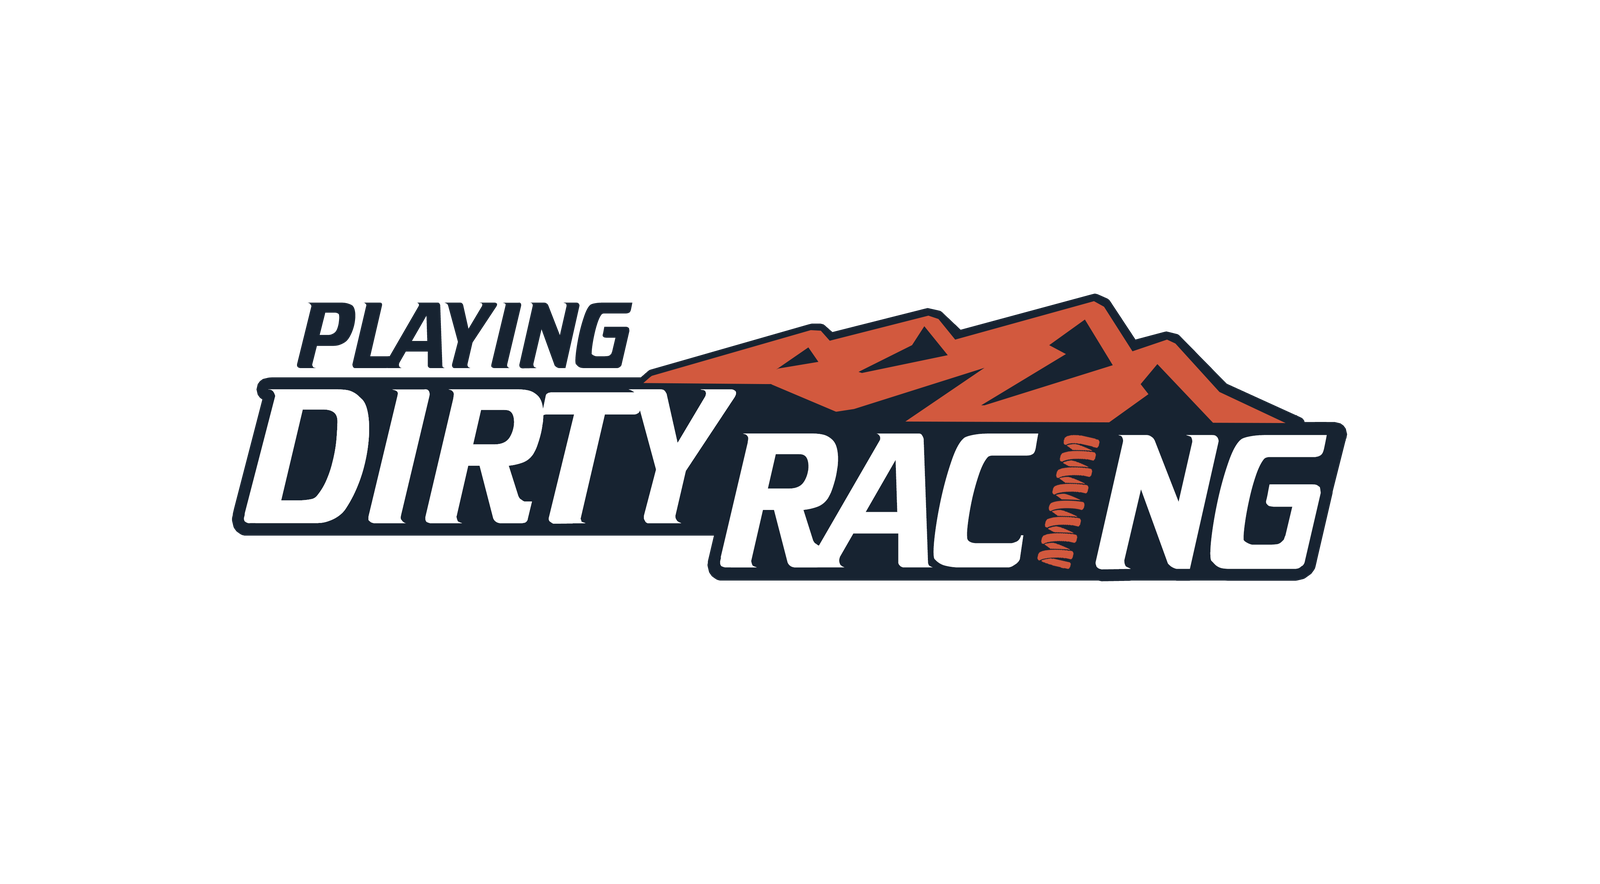 Playing Dirty Racing LLC